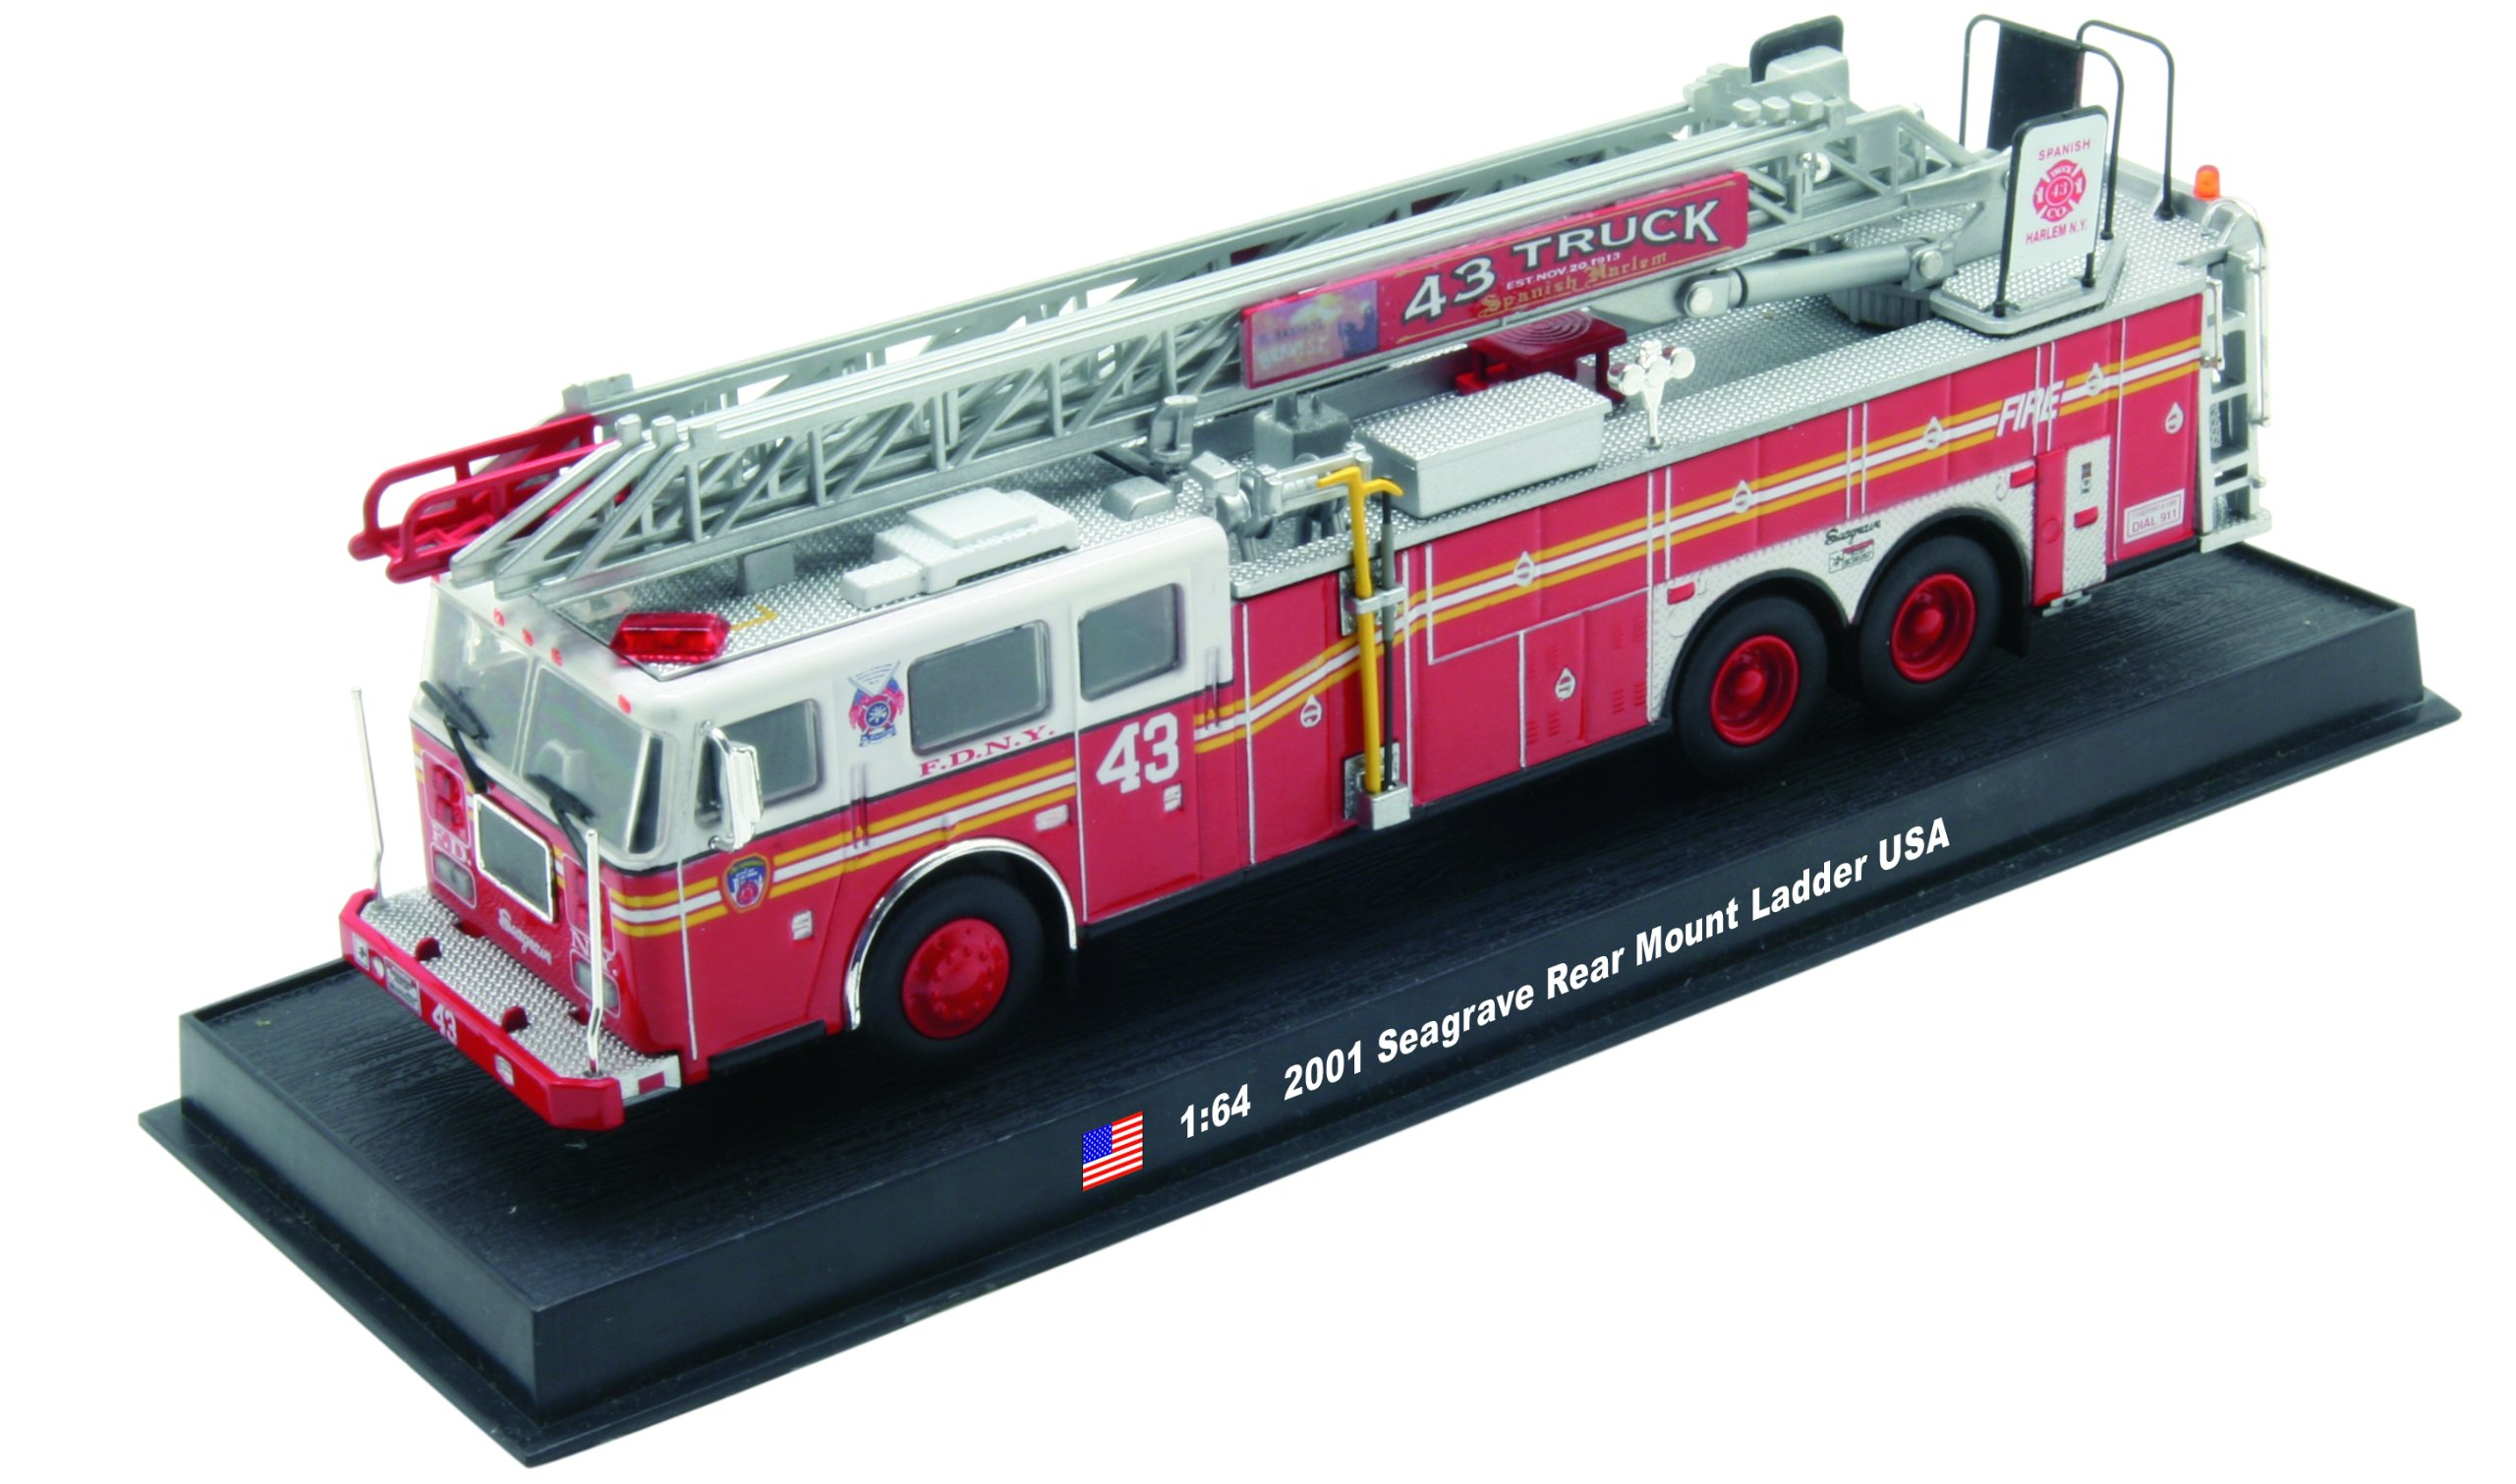 Seagrave Rear Mount Ladder Fire Truck Diecast 1:64 Model Amercom ...